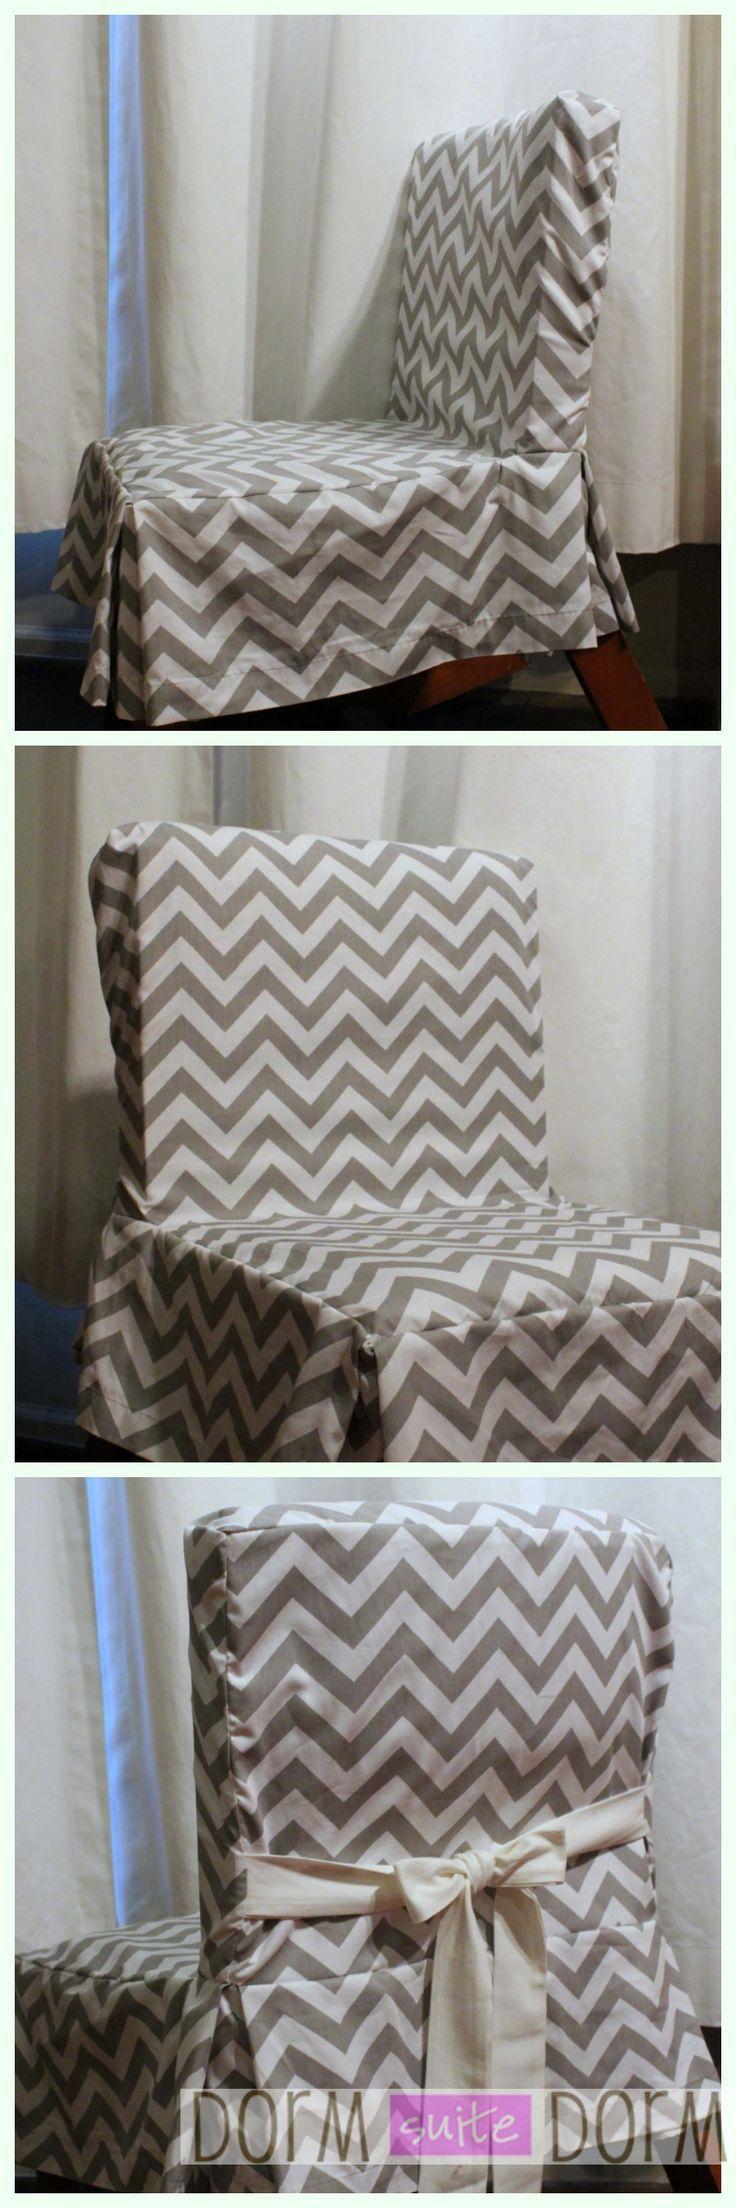 ~~REPIN~~ Cute dorm room chair cover #dorm #dormbedding